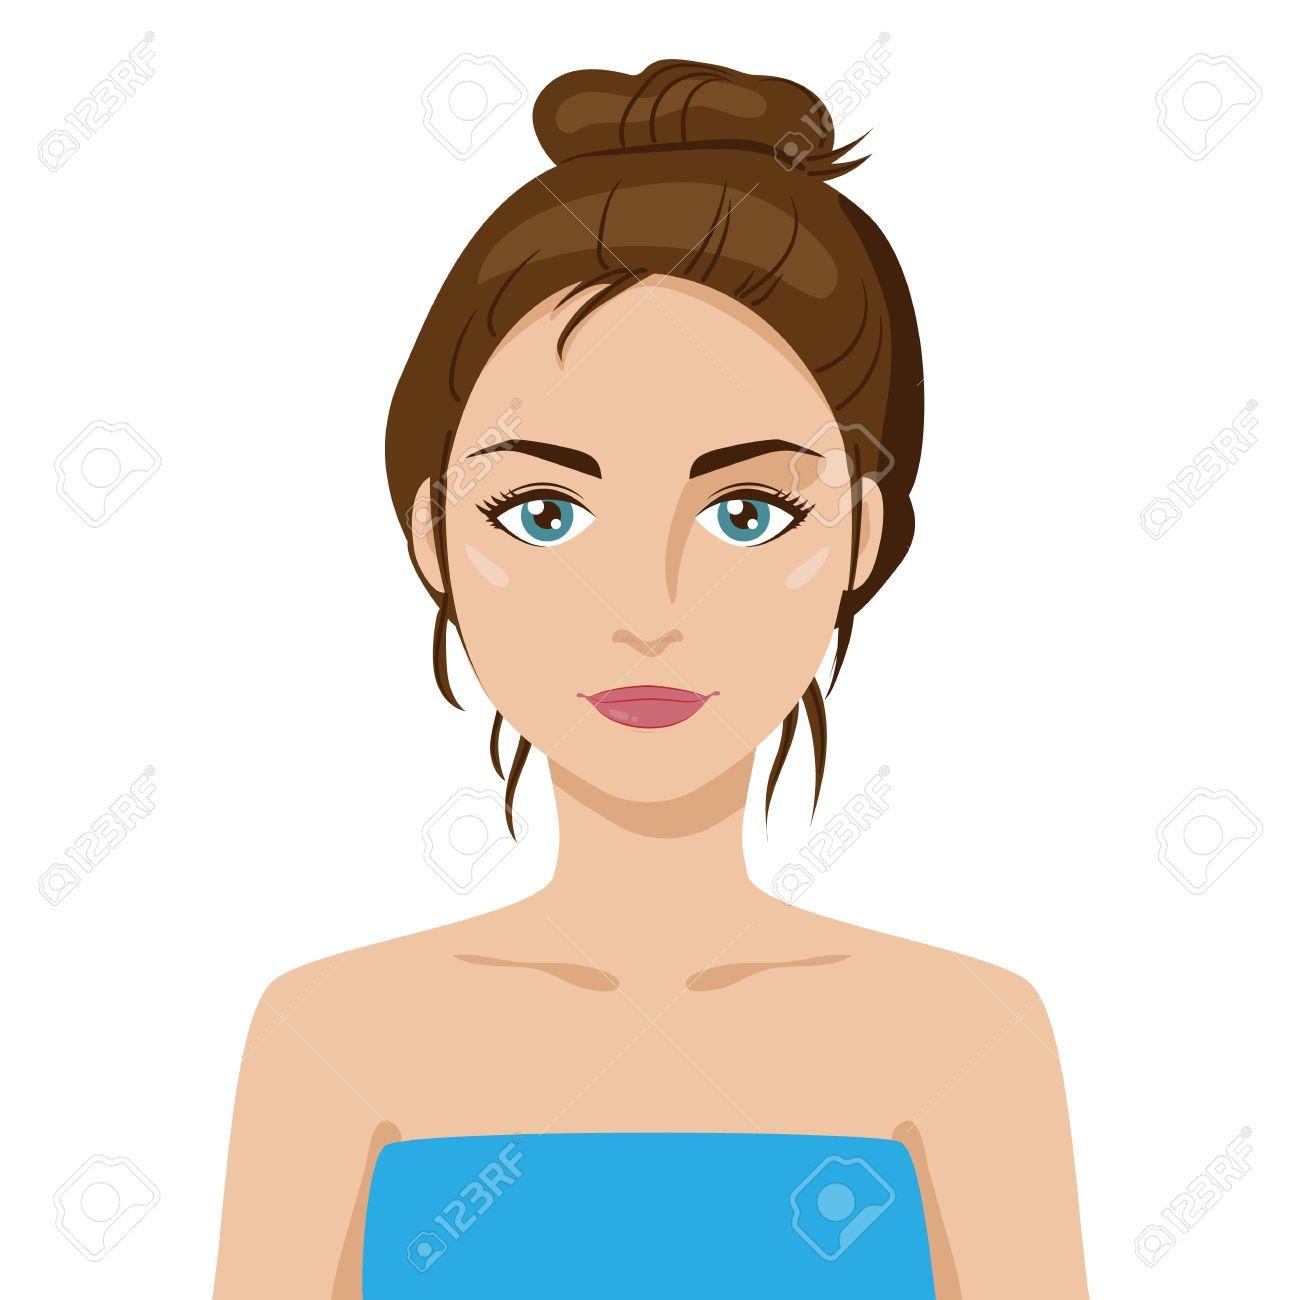 Beautiful Friendly Young Girl With Hair Bun Dark Hair Cartoon Royalty Free Cliparts Vectors And Stock Illustration Image 61116582